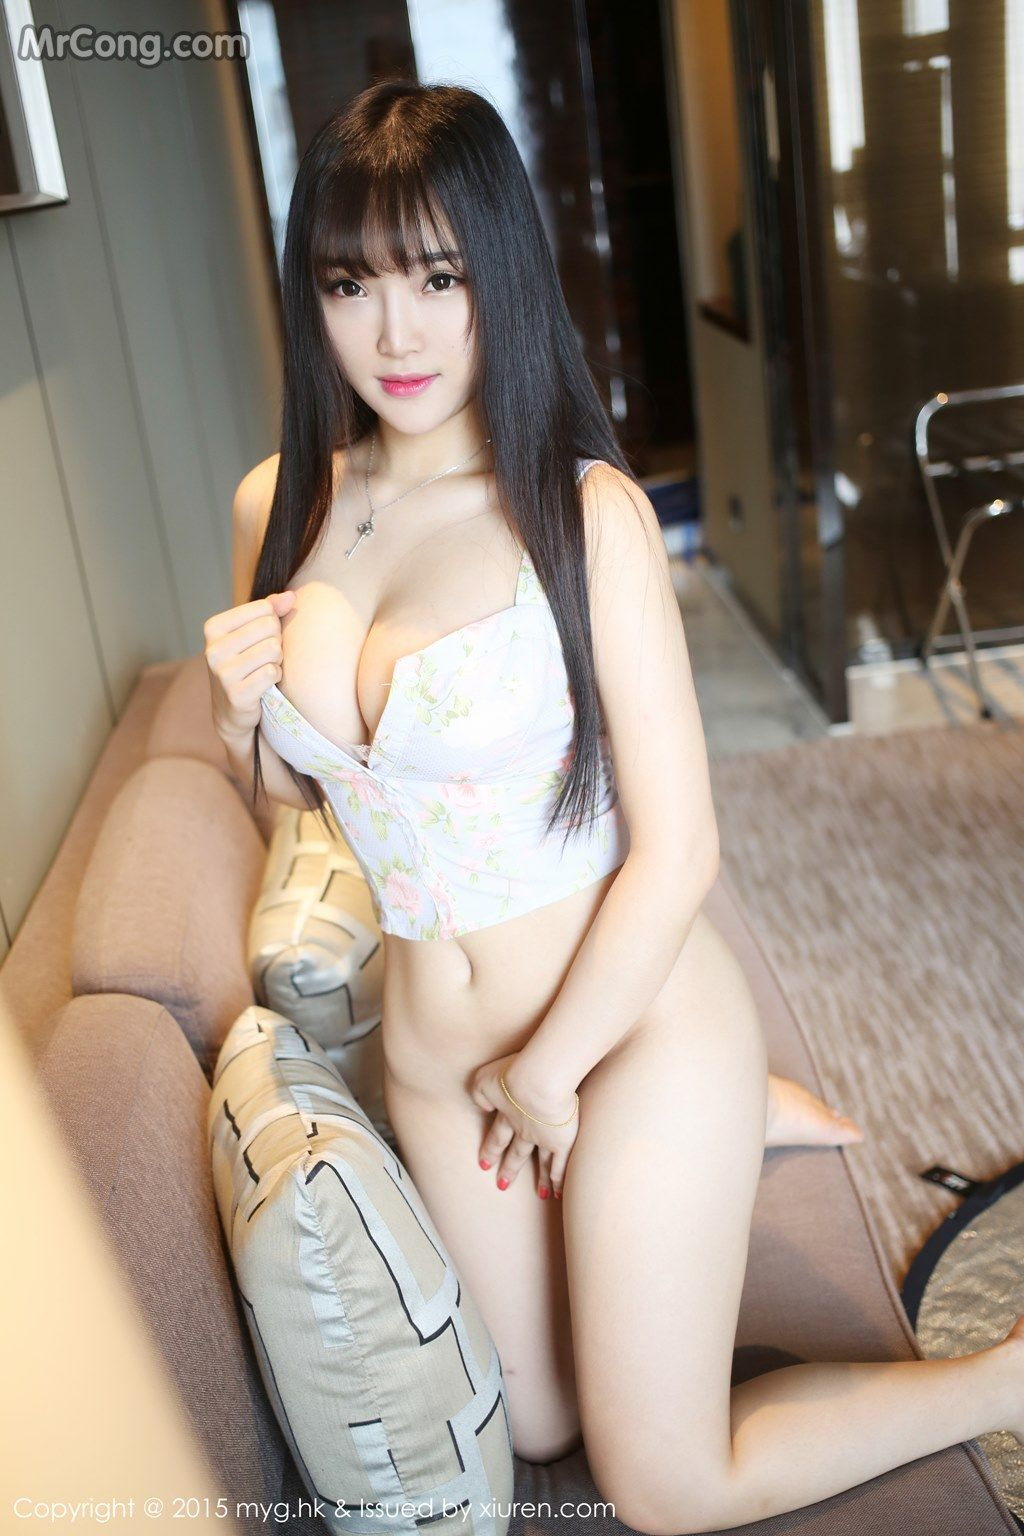 Sexy light skinned girls gif nude